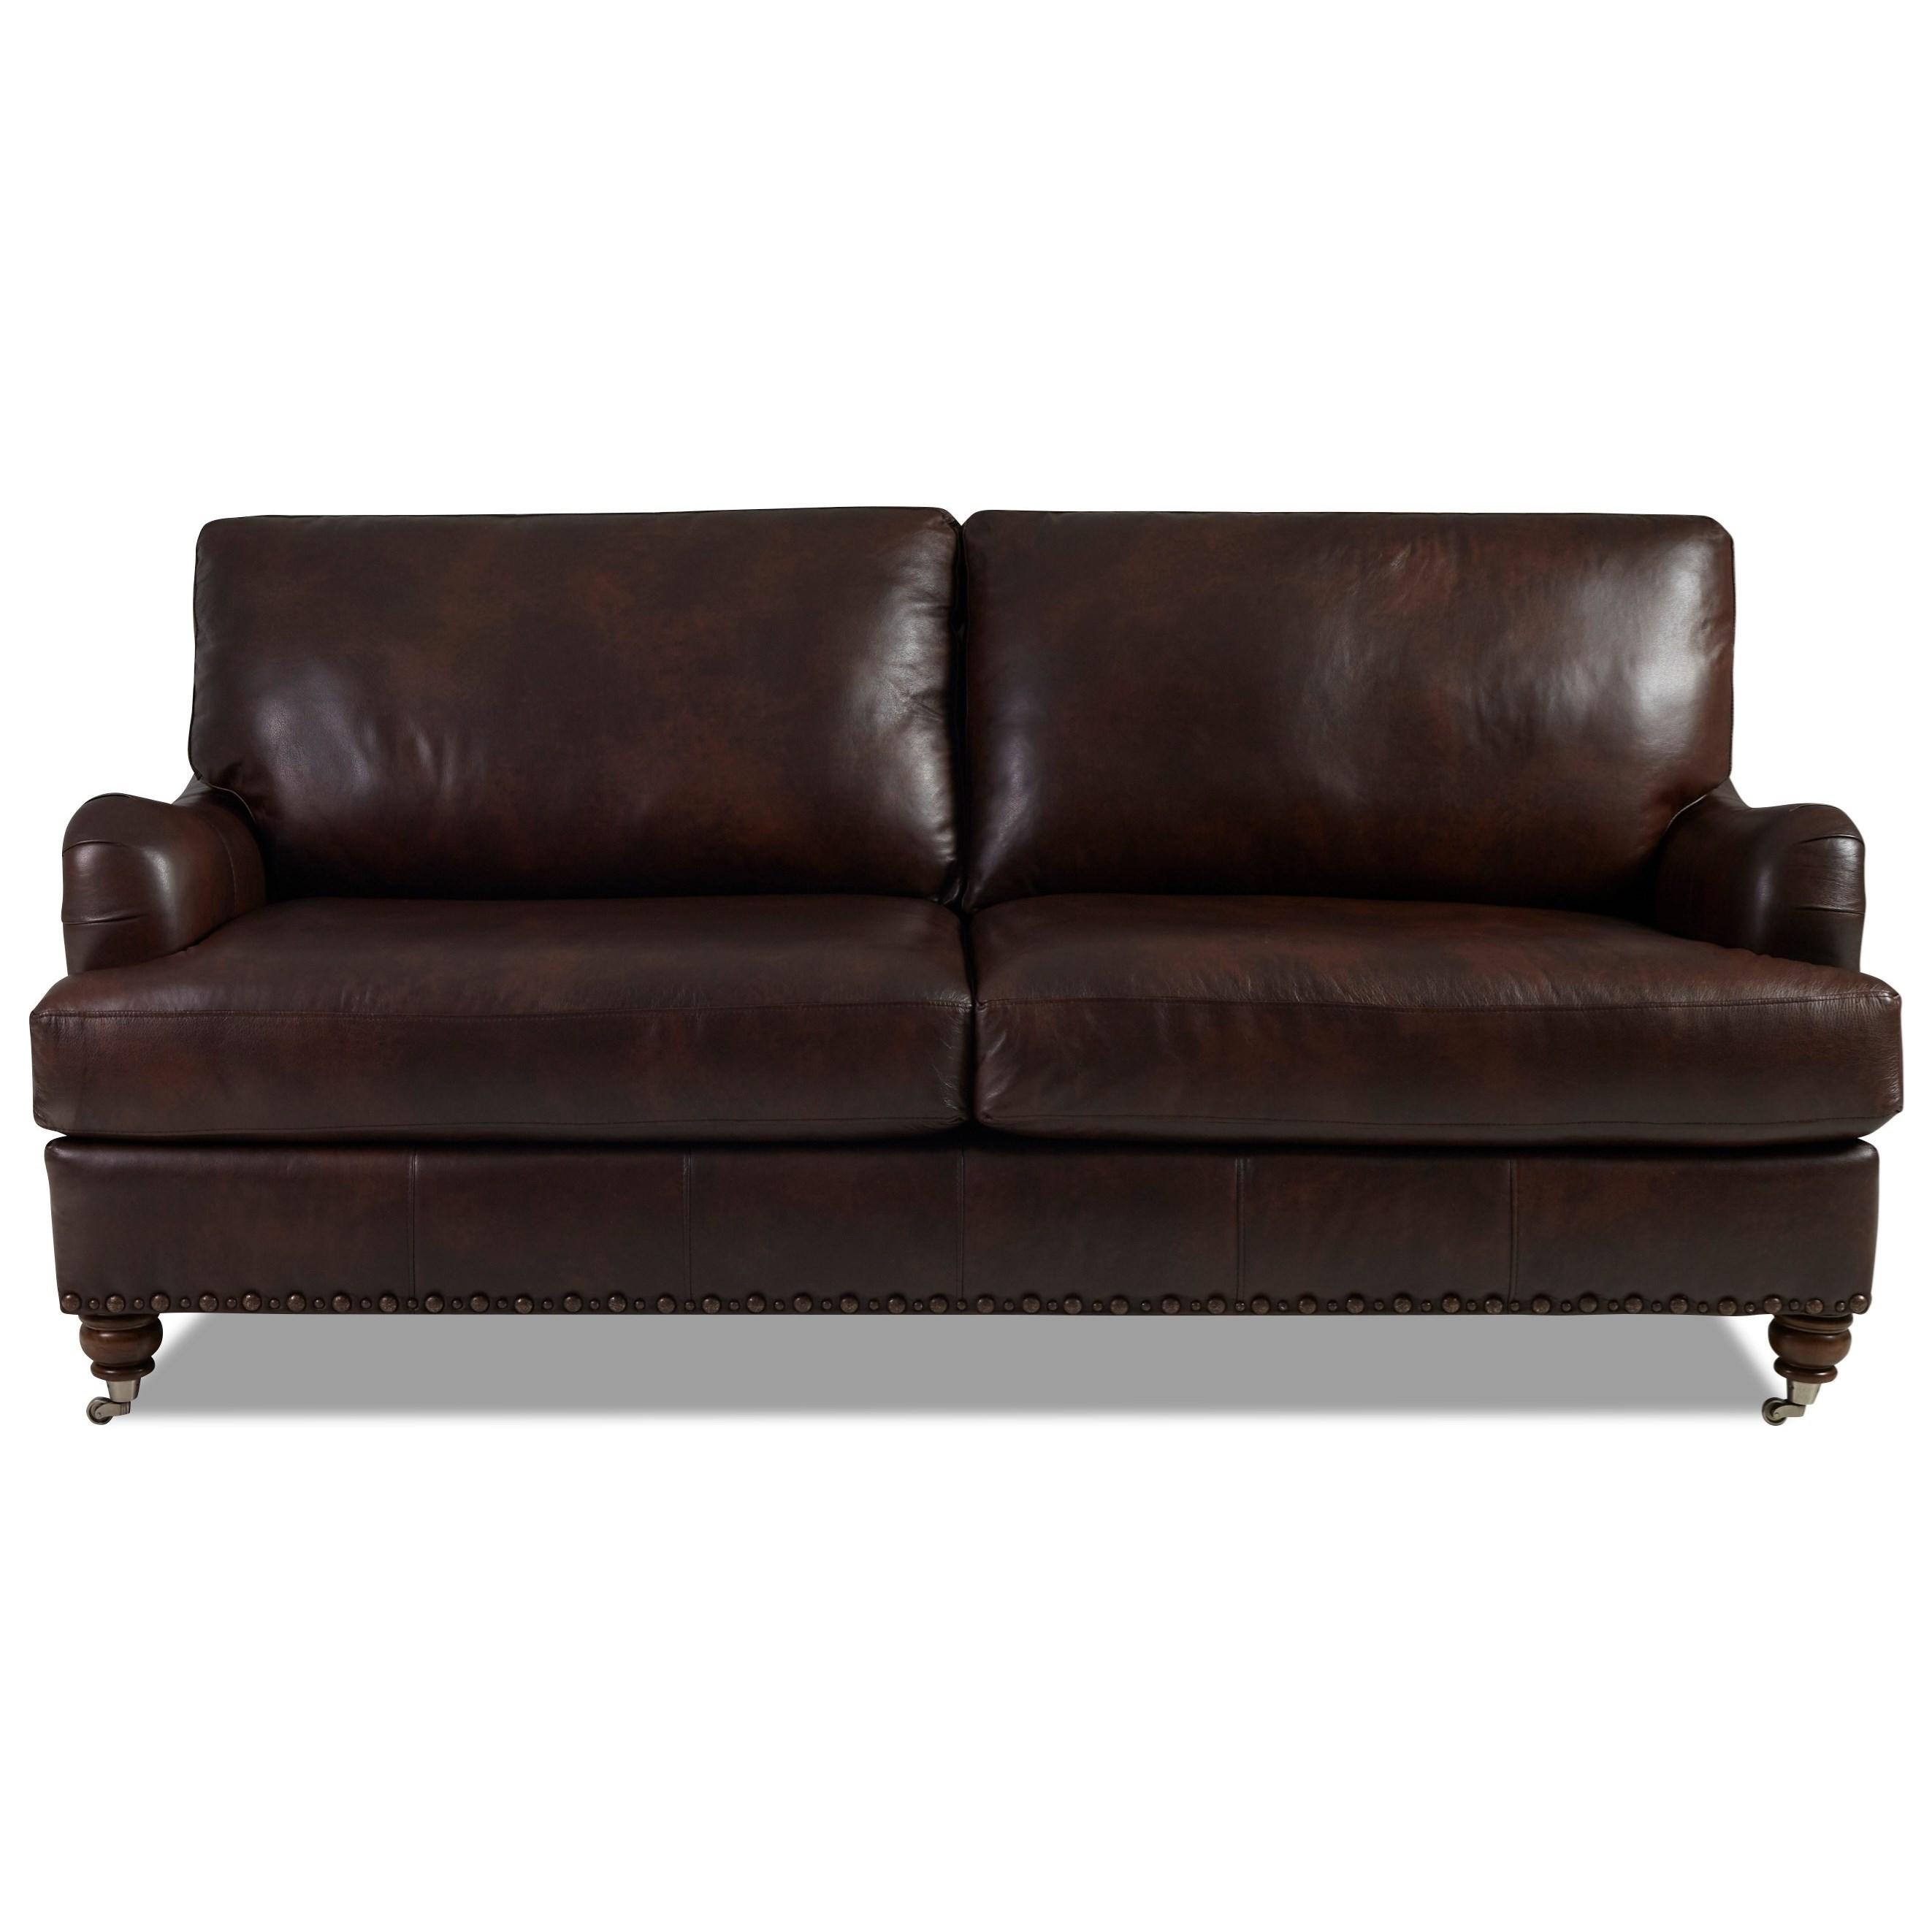 Alden Sofa by Klaussner at Johnny Janosik